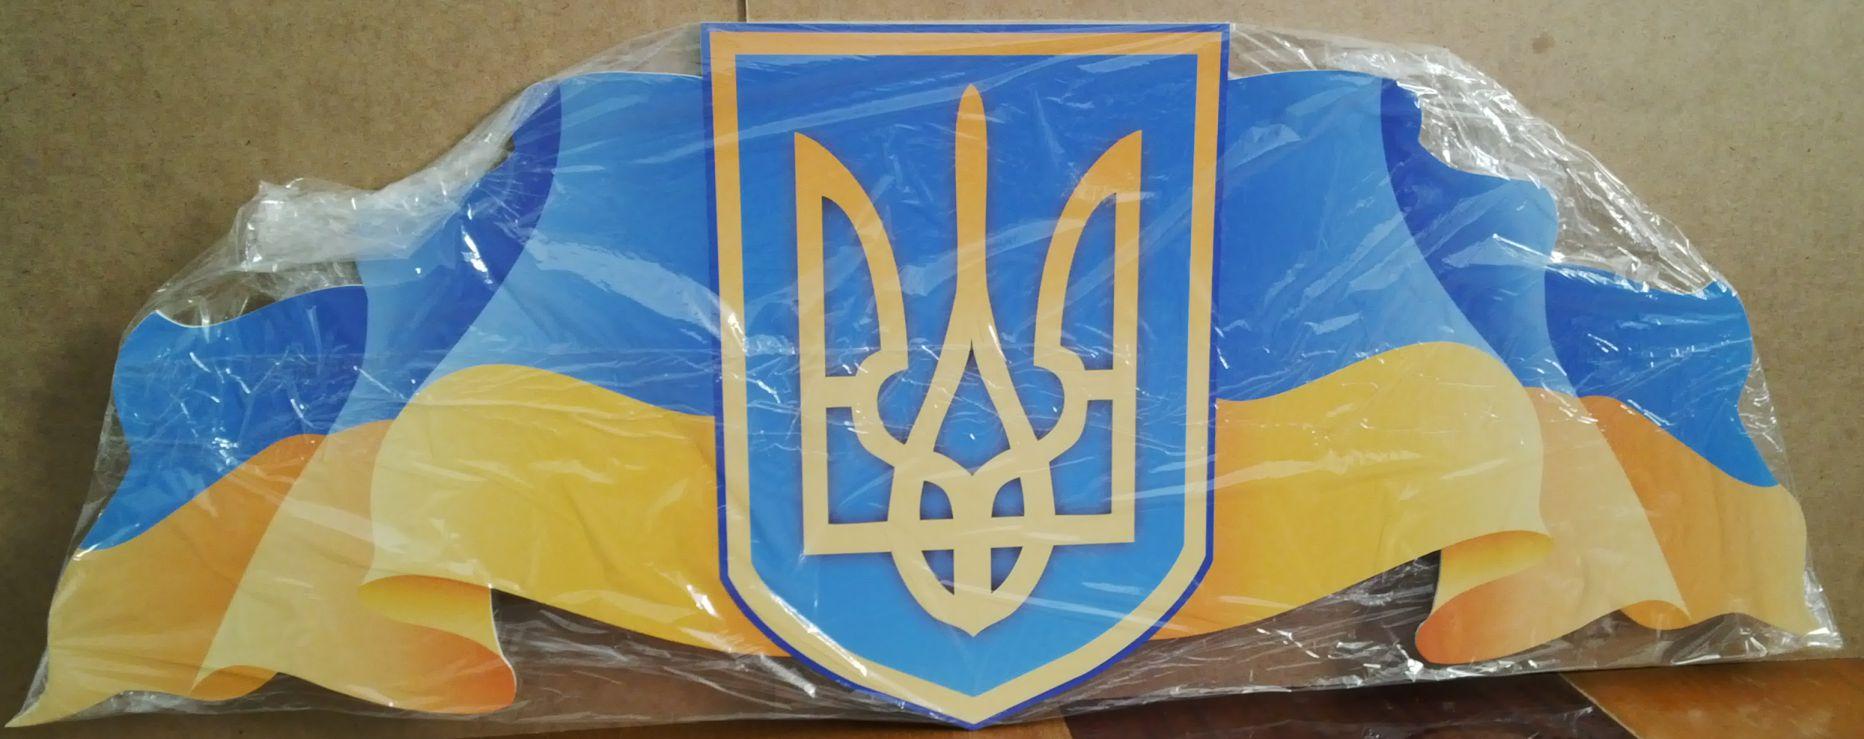 стенд символіка, державна символіка, державні символи, герб, прапор, гімн, стенд символика, государственная символика, государственные символы, герб, флаг, гимн, купити, замовити, купить, заказать, Україна, Украина, стенди для школи купити, стенди для школи замовити, стенди для кабінету, стенди для шкільного кабінету, оформлення кабінетів, оформлення шкільного кабінету, стенды для школы купить, стенды для школы заказать, стенды для кабинета, стенды для школьного кабинета, Україна, Украина,